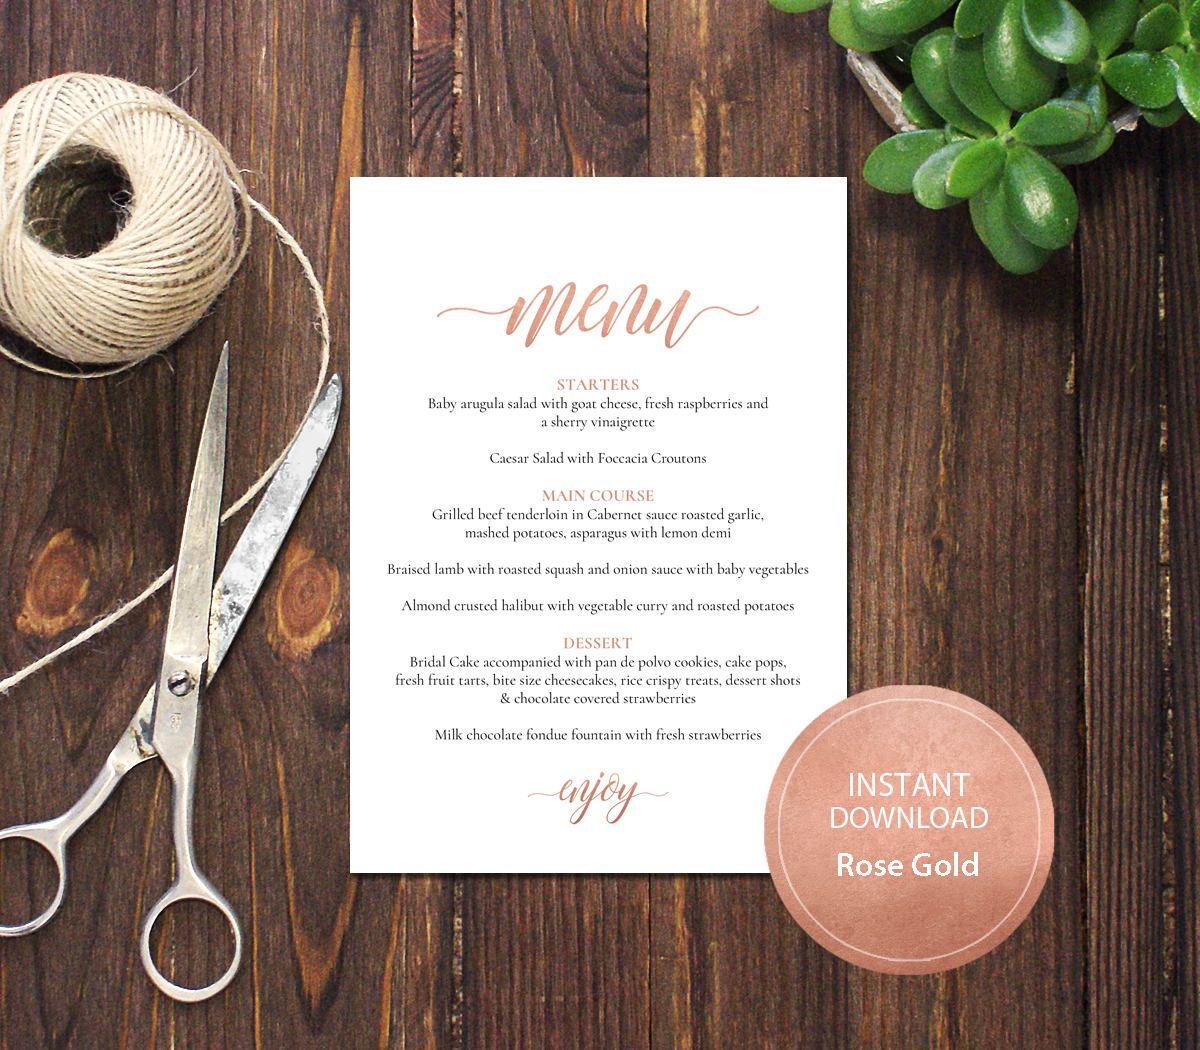 bridal shower invitations free printable templates%0A PDF Template  x  Menu Wedding Bridal Shower INSTANT DOWNLOAD Rose Gold Diy  Table Menu calligraphy Editable Menu Printable Digital  DP       by